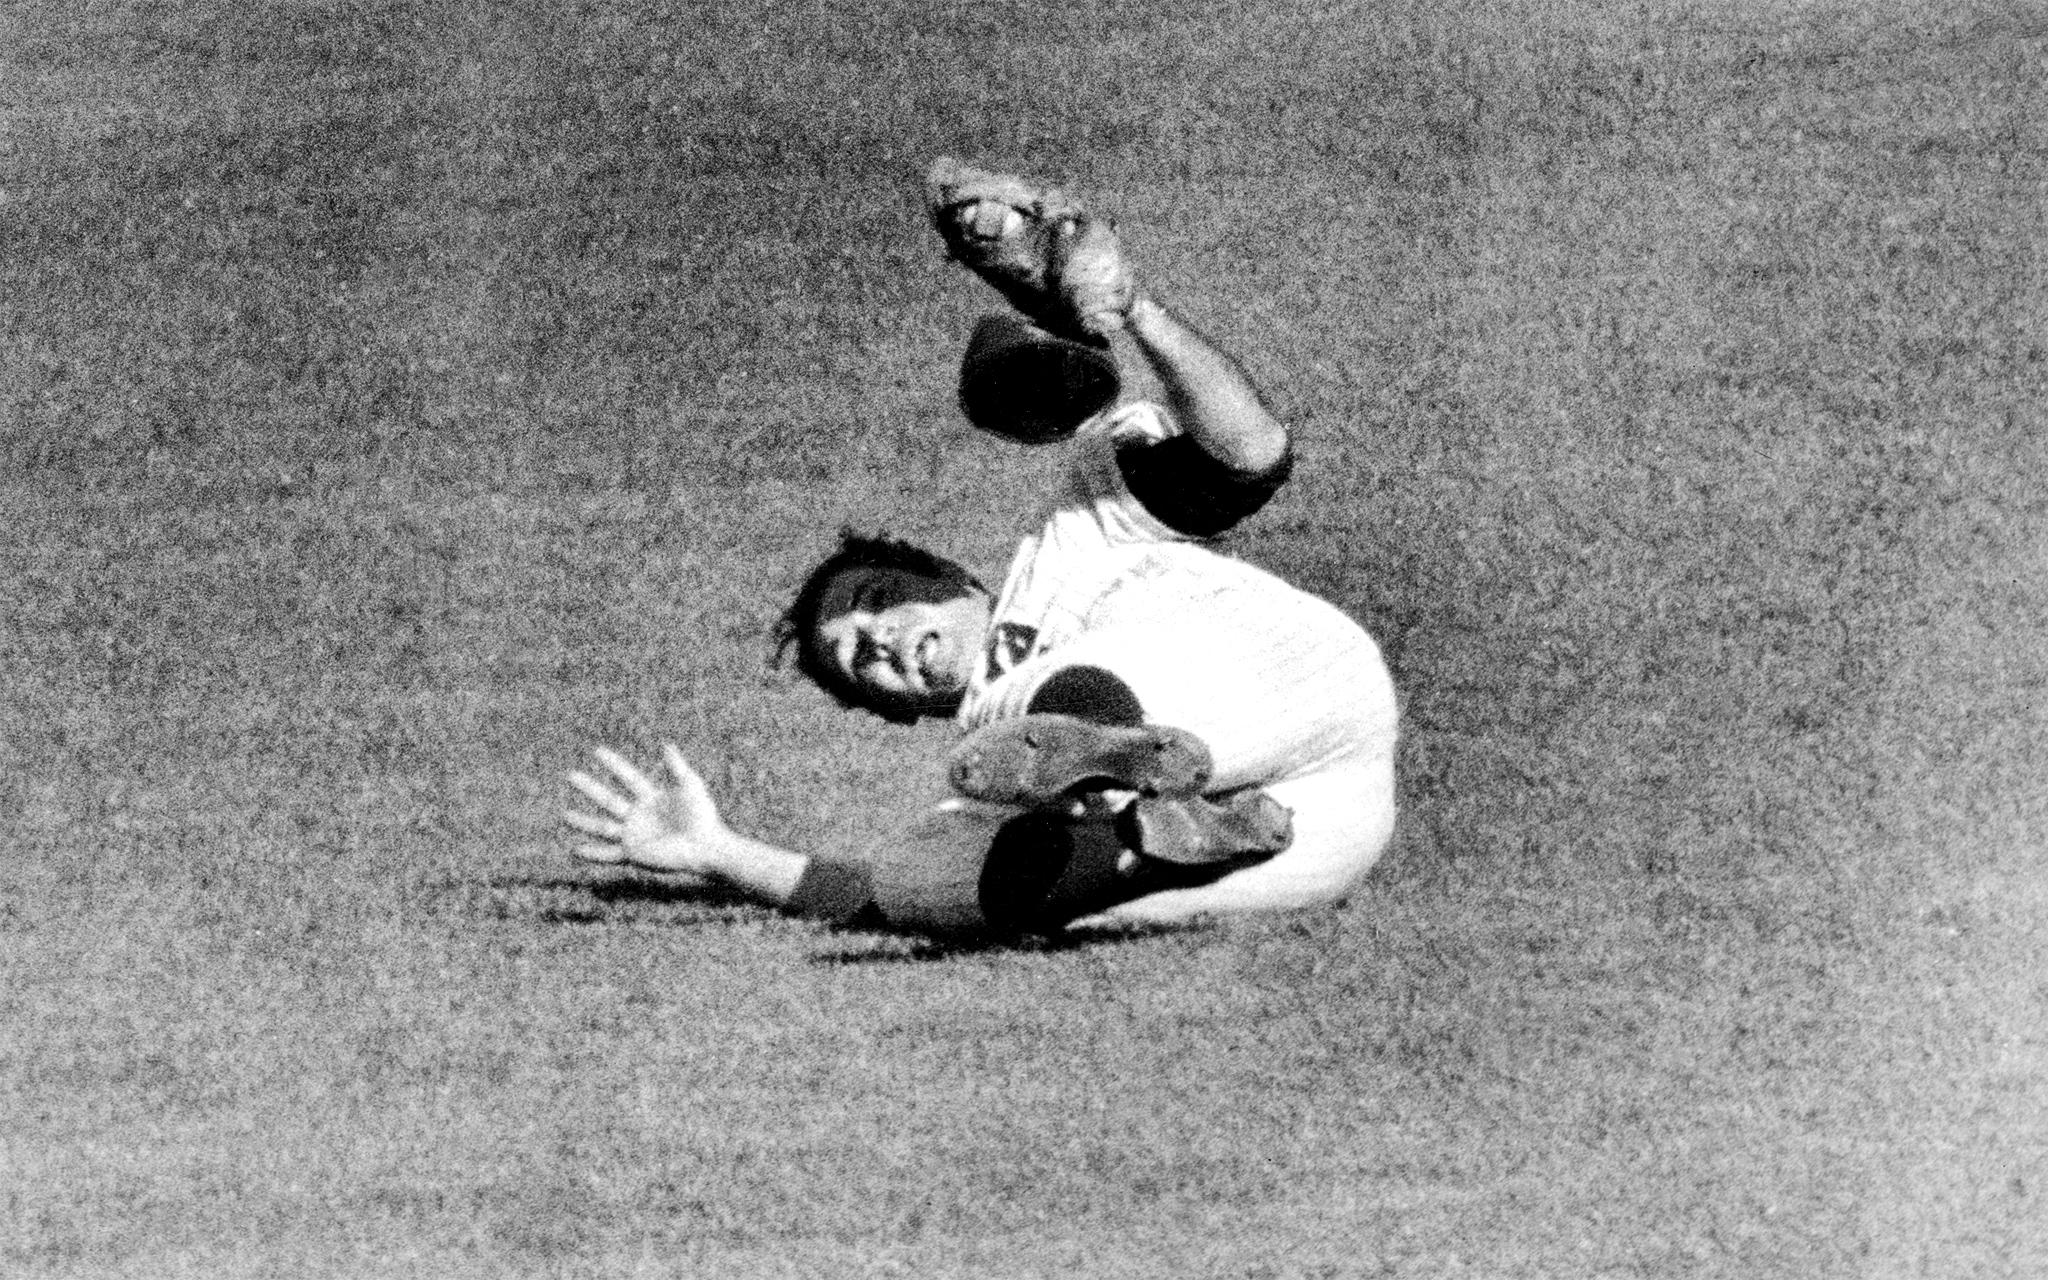 Ron Swoboda: 1969 World Series, Game 4 - Greatest OF catches in MLB  postseason history - ESPN